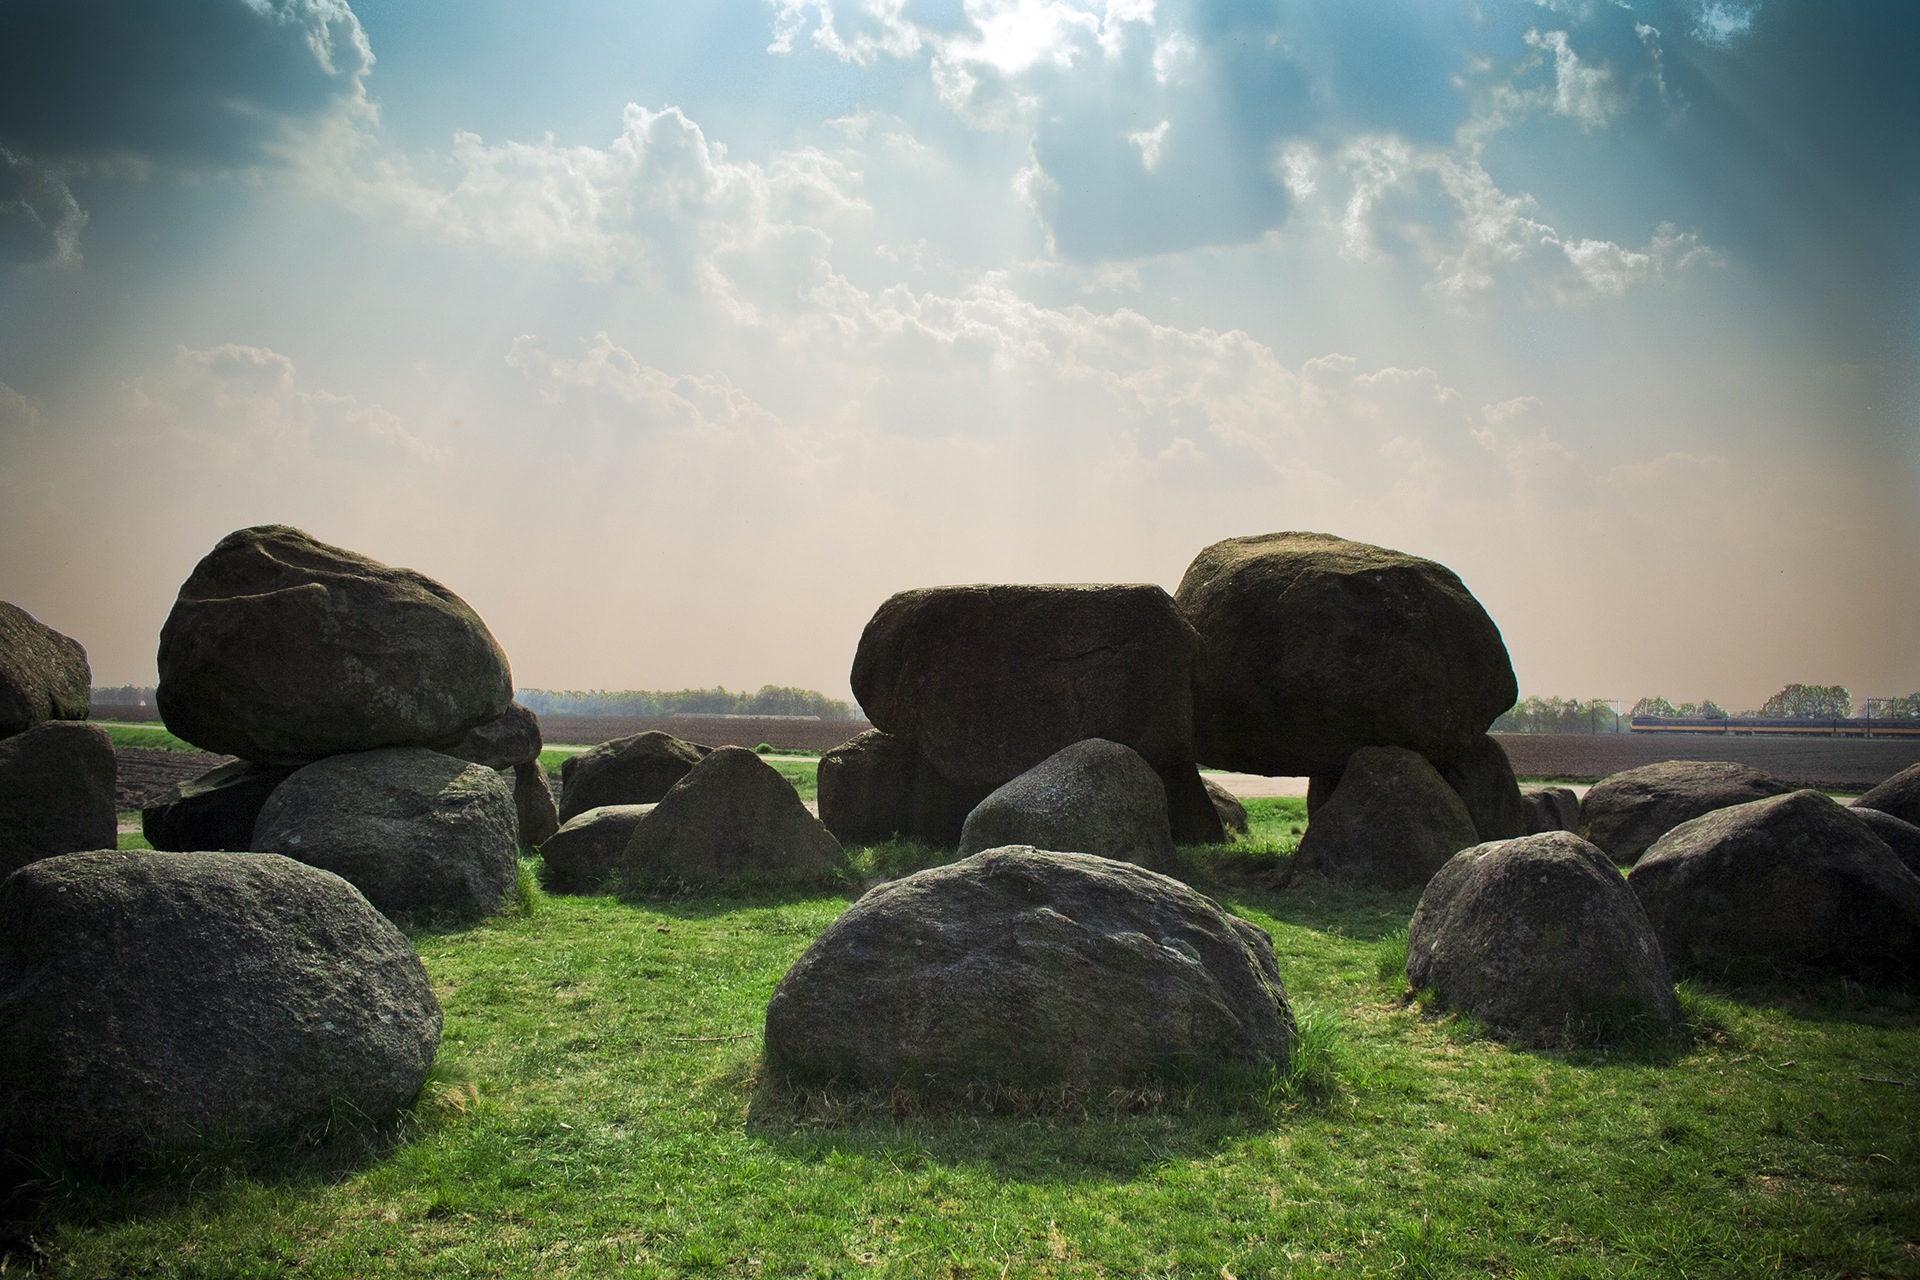 pierres, pelouse, Rocas, Sky, lumière - Fonds d'écran HD - Professor-falken.com